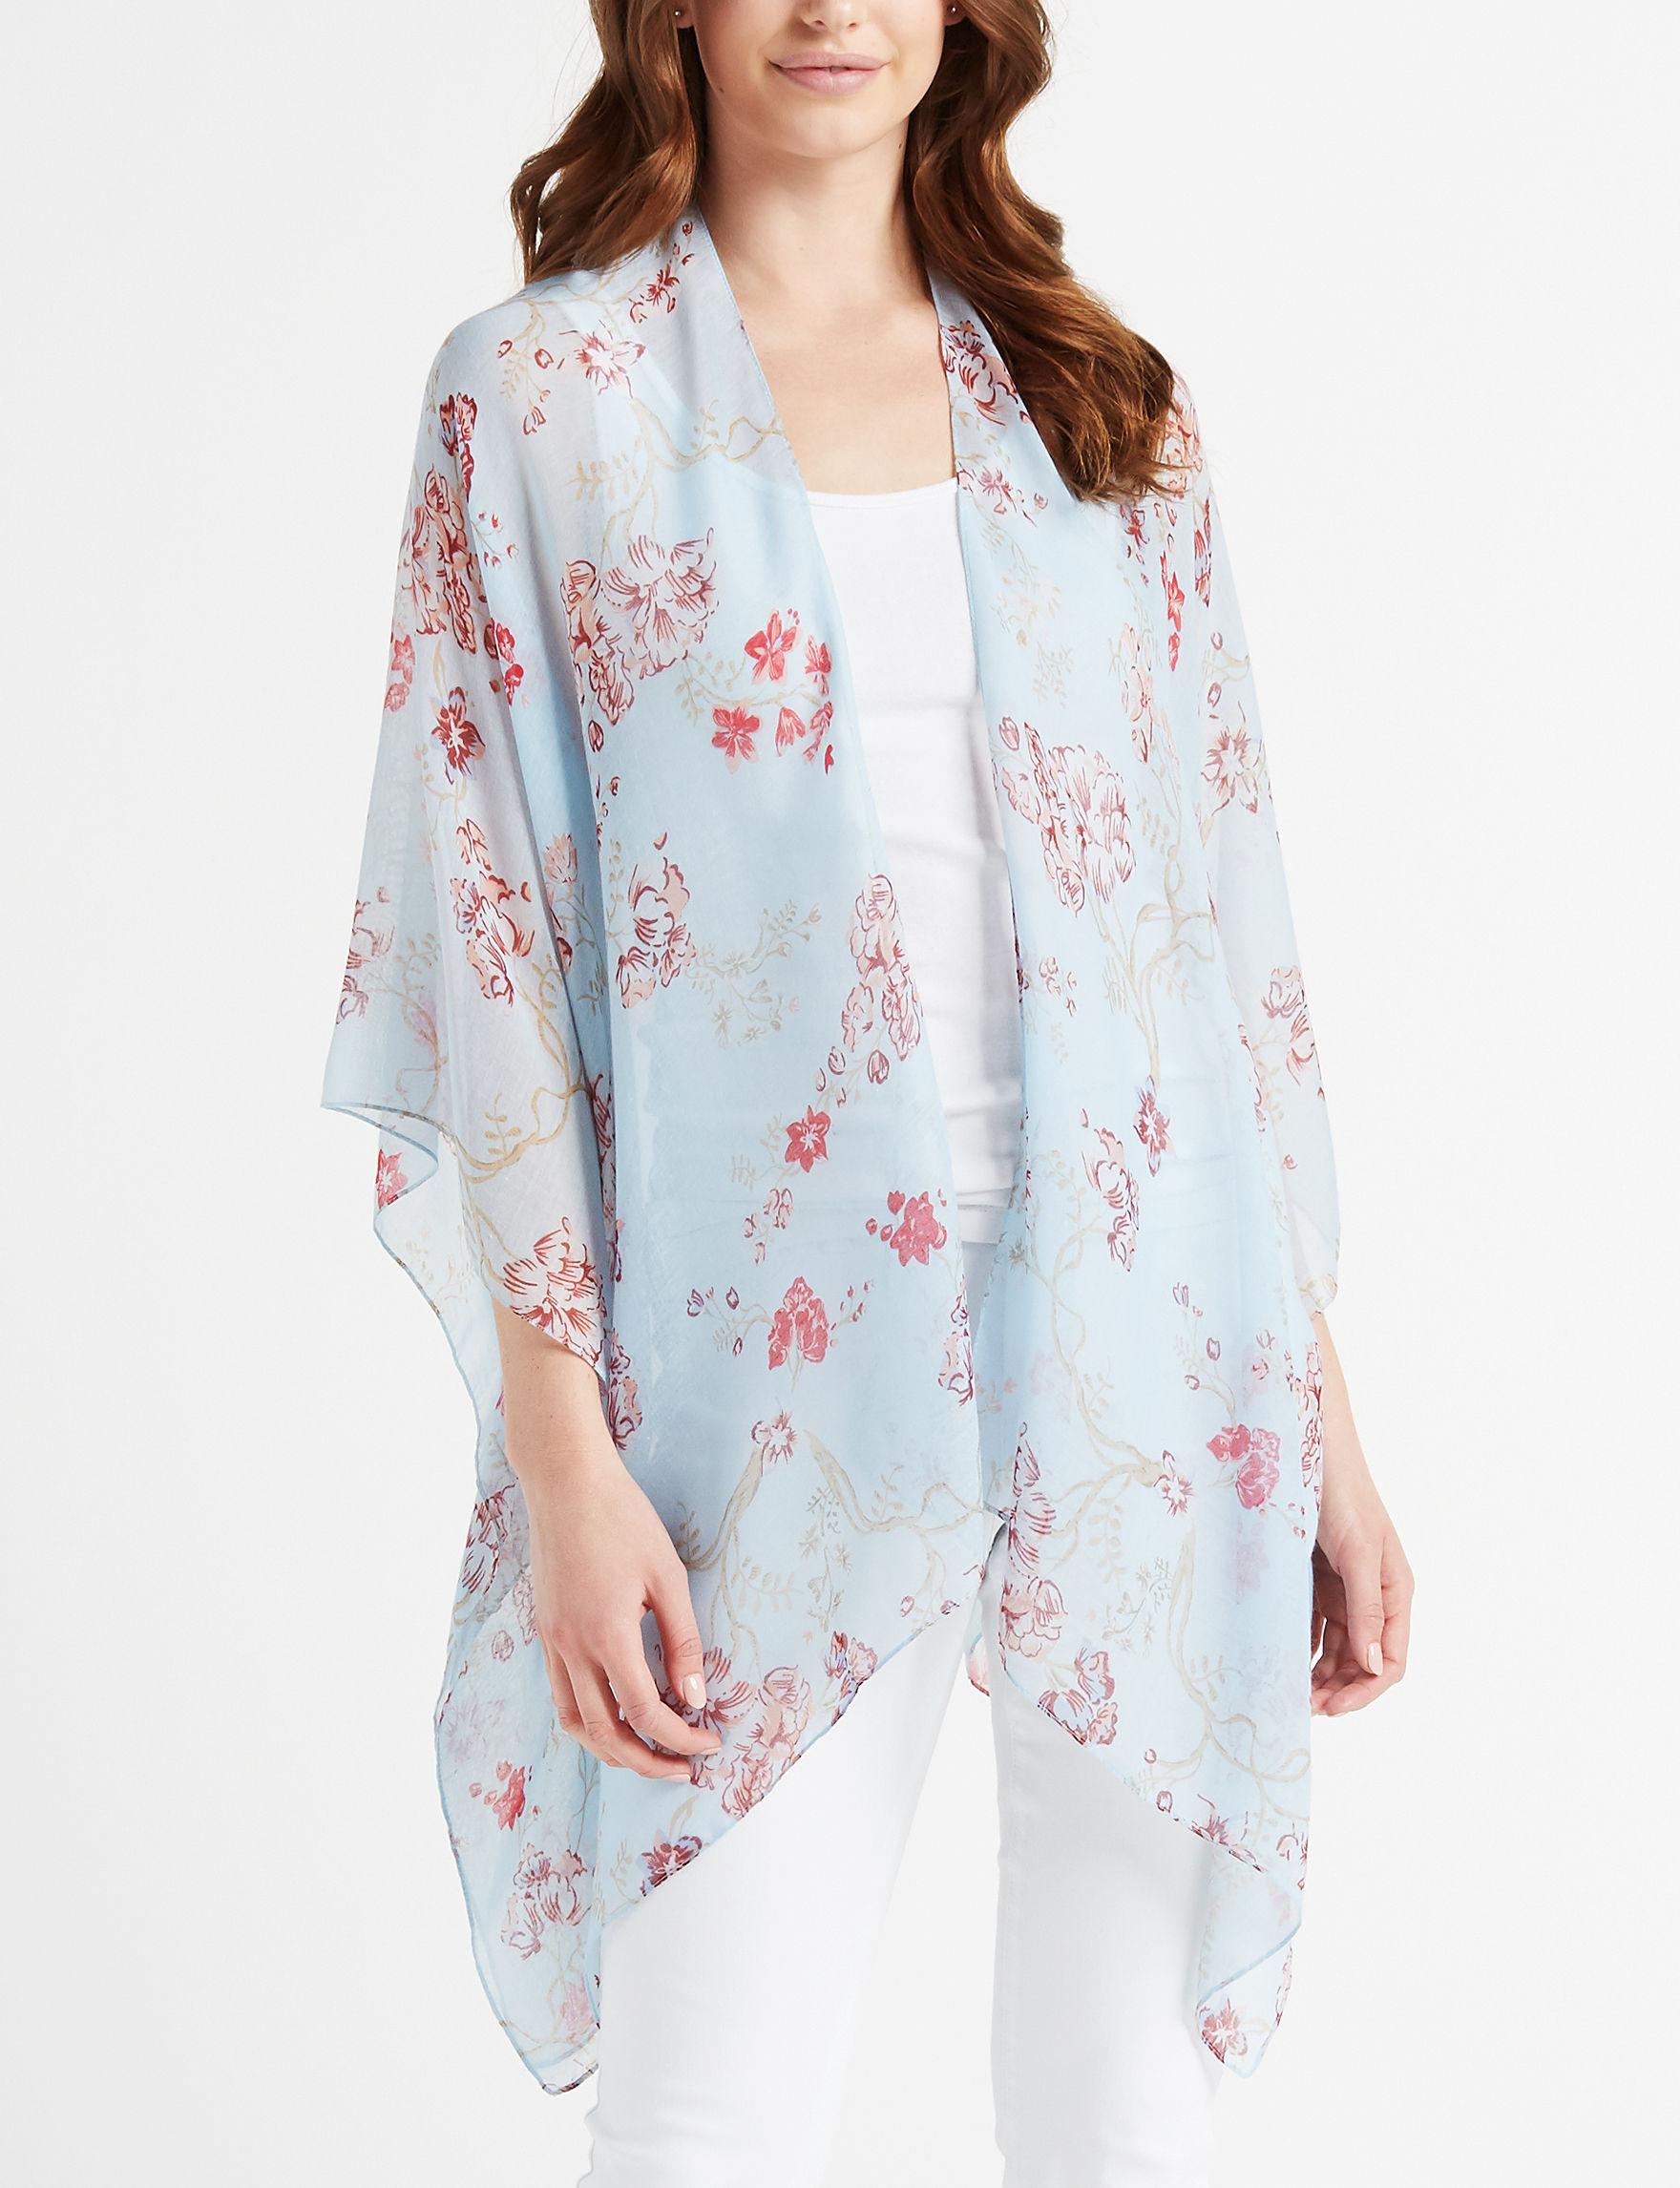 Basha Blue Floral Kimonos & Toppers